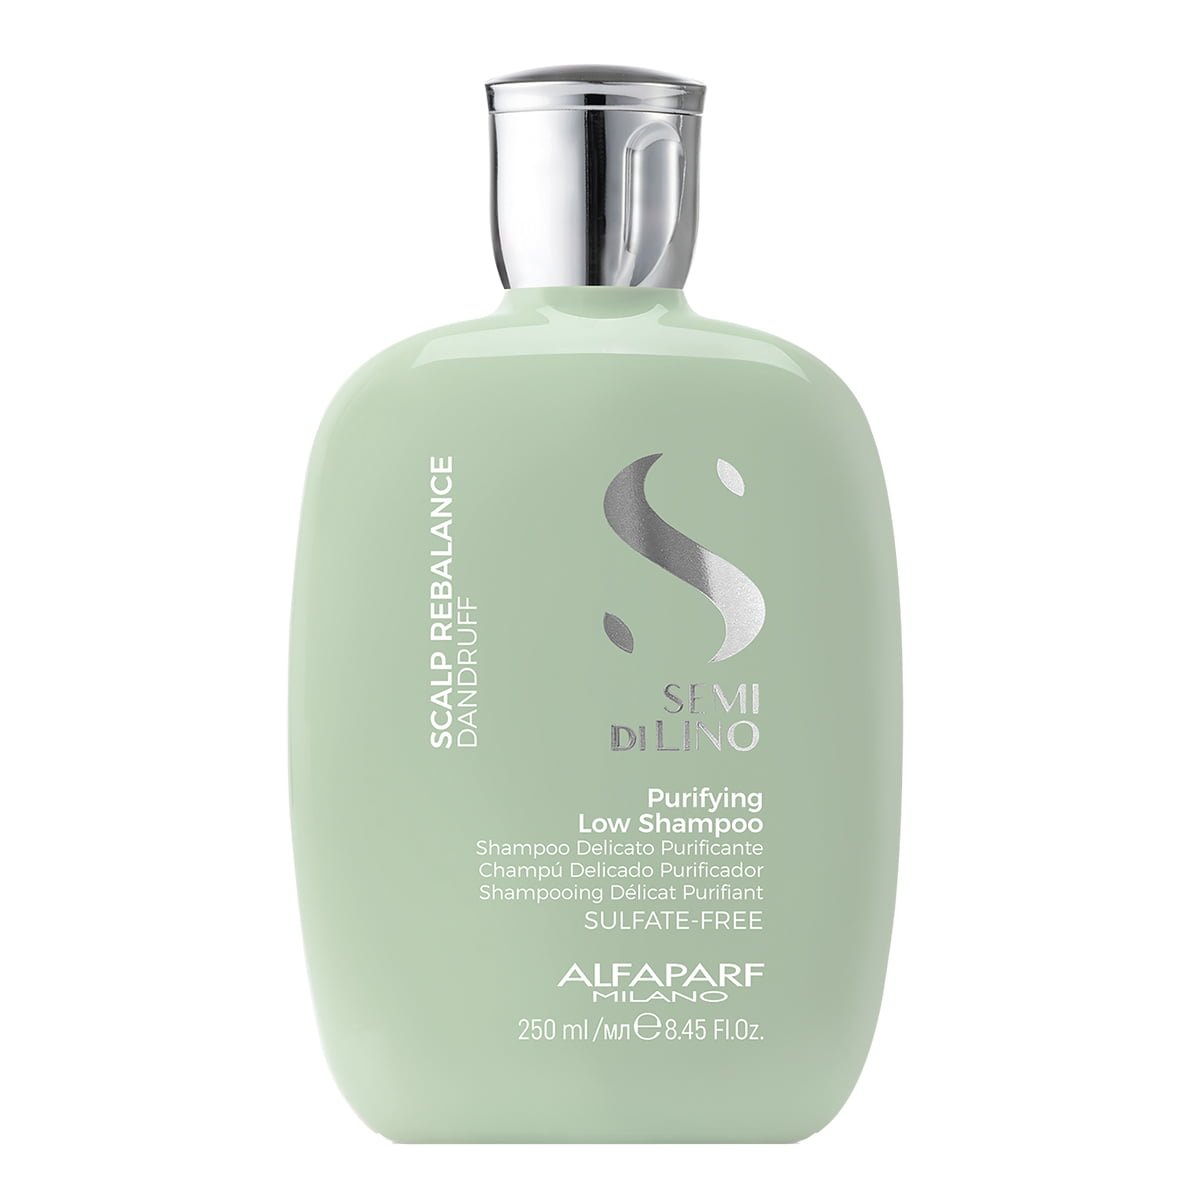 Semi Di Lino - Purifying Low Shampoo 250ml - Alfaparf Scalp